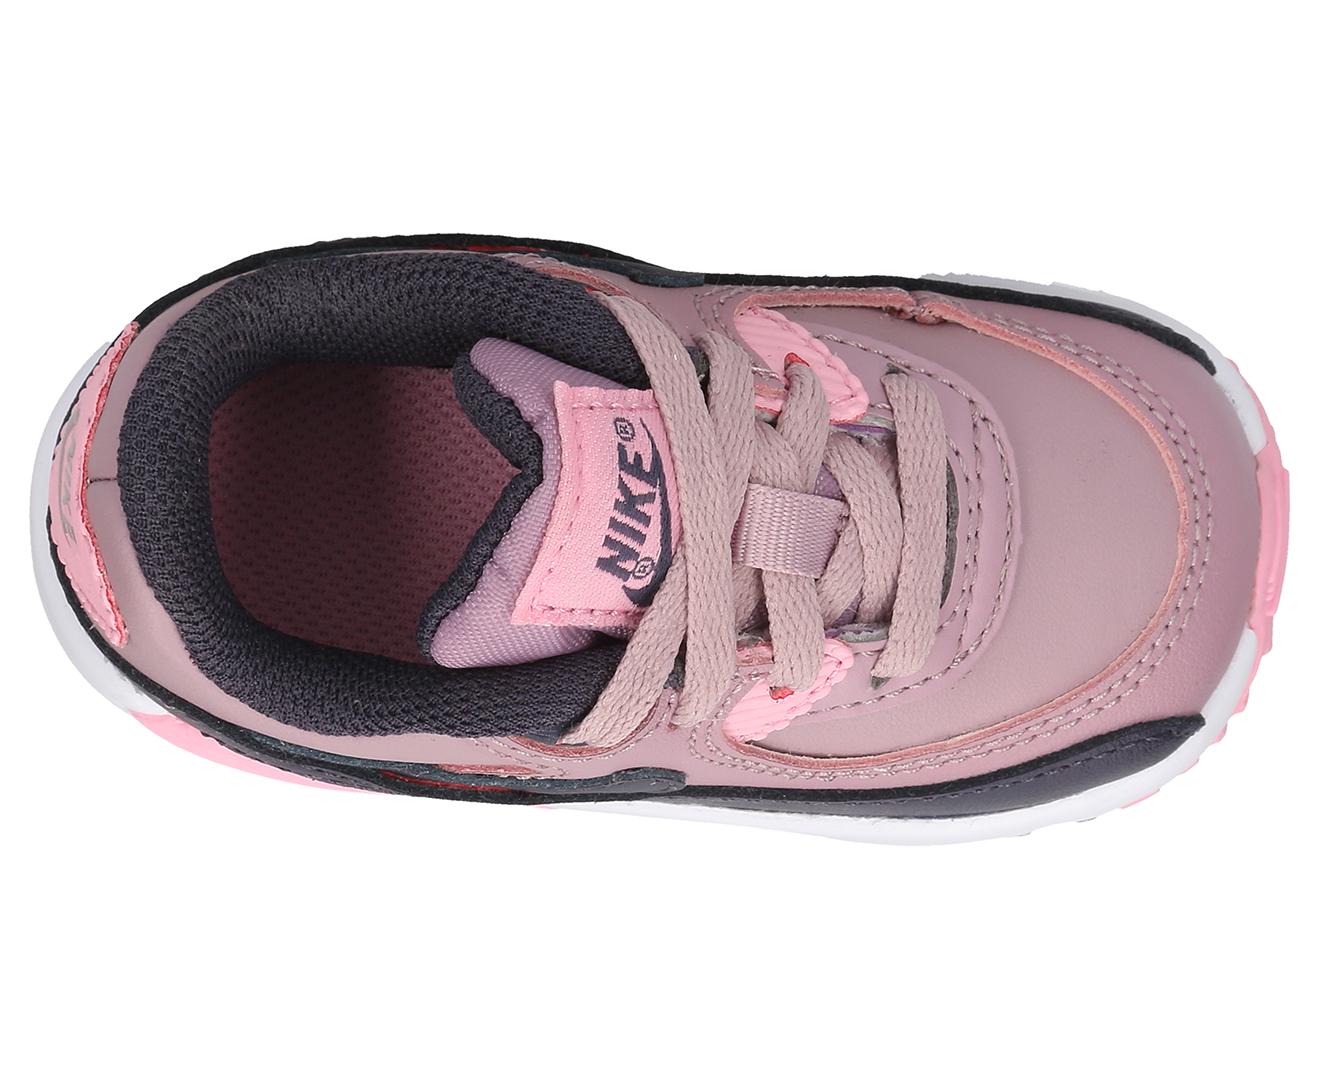 size 40 758e5 da219 Nike Toddler Girls  Air Max 90 LTR Shoe - Elemental Rose Gridiron-Pink    Catch.com.au